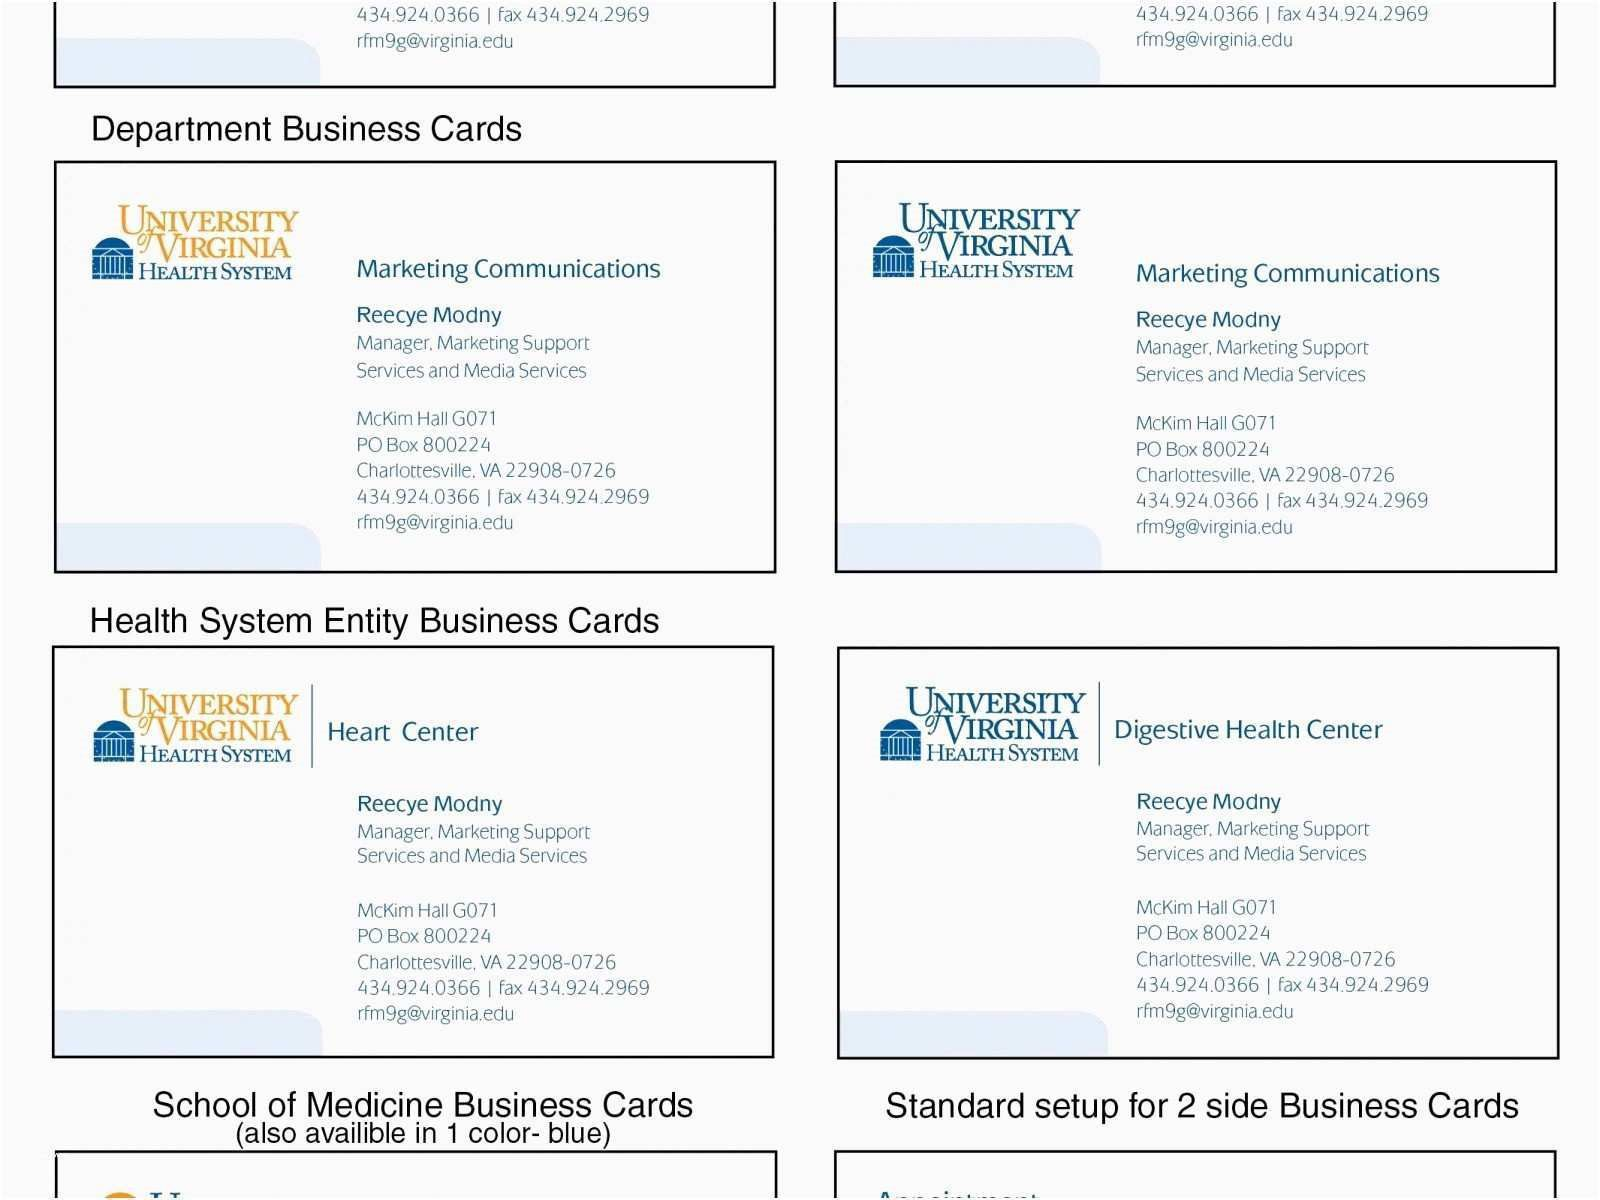 003 Best Staple Busines Card Template Psd Idea Full